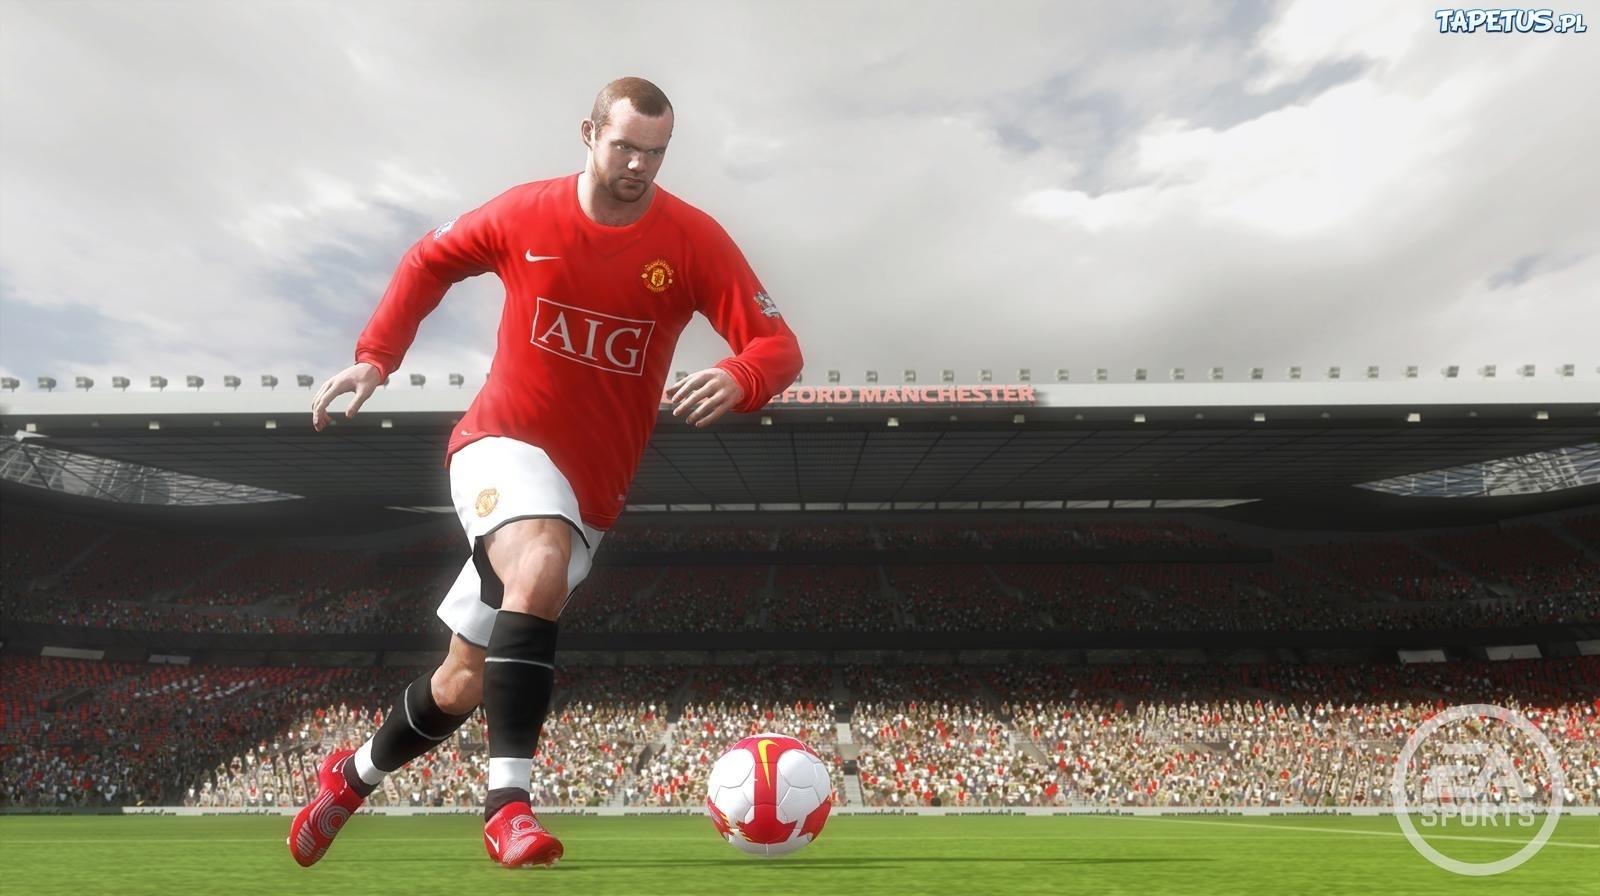 Rooney Fifa 16